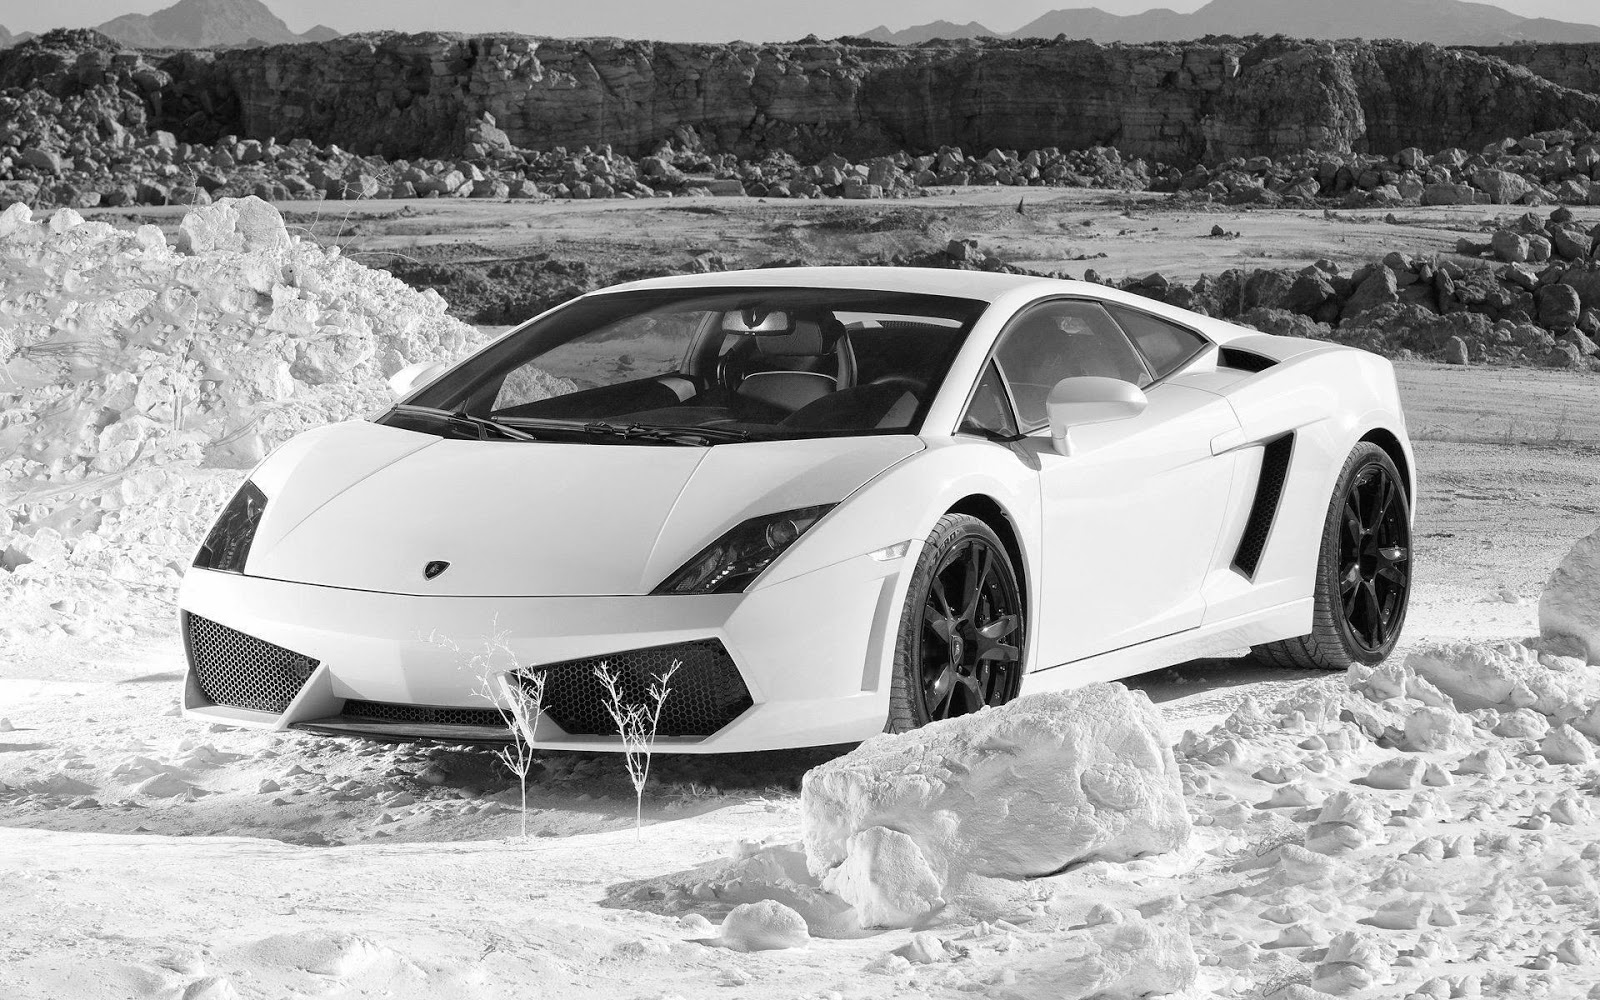 http://www.autocarsinfo.com/2015/01/lamborghini-gallardo-lp-560-4-best.html